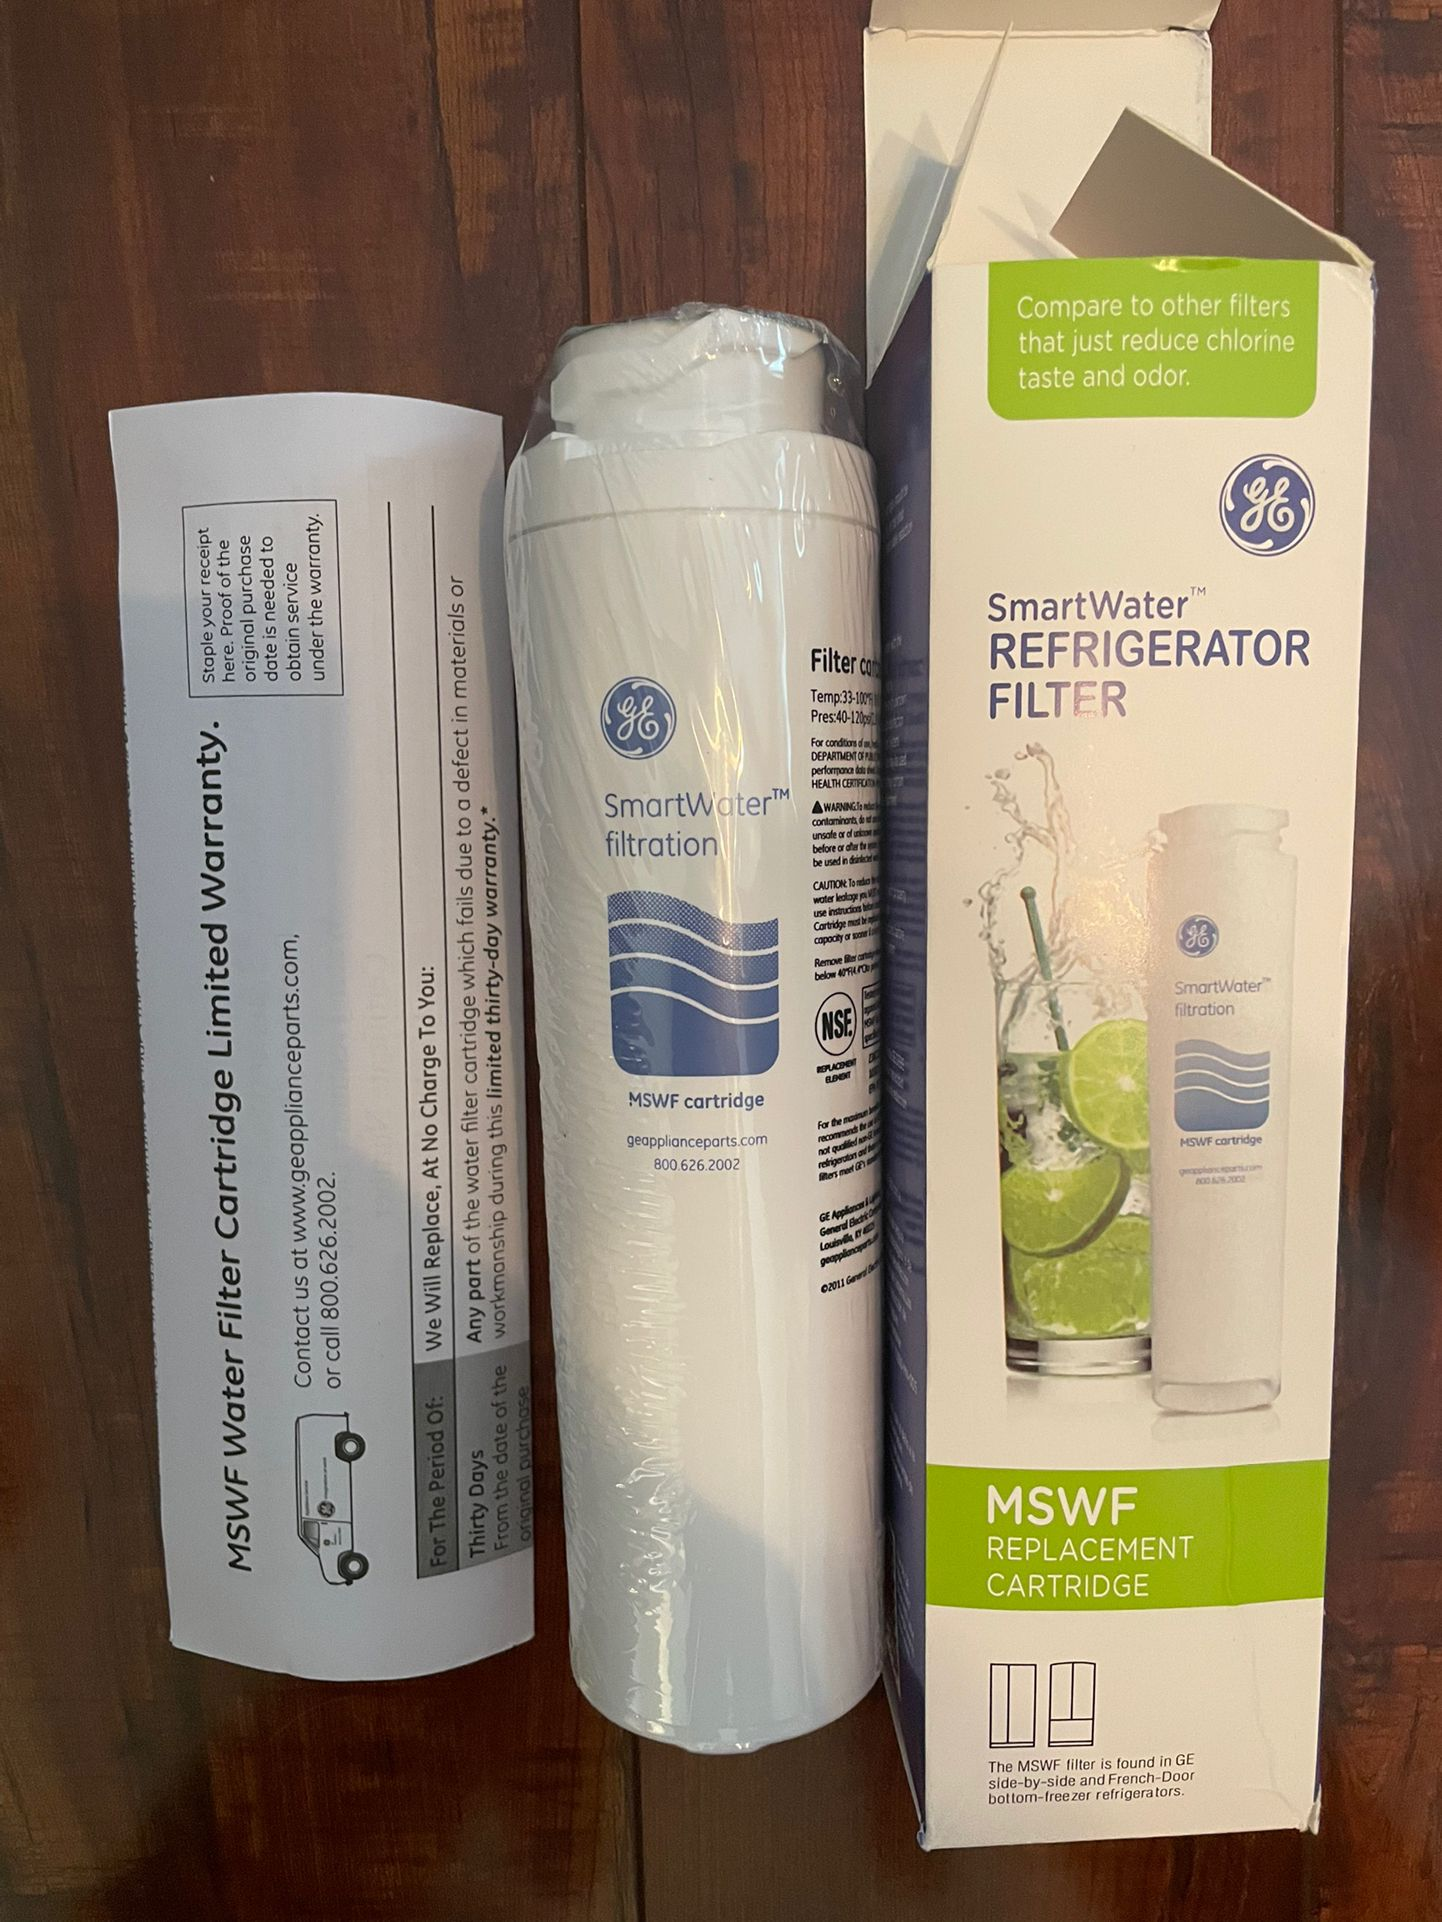 GE MSWF Refrigerator Filter - Brand New In Box